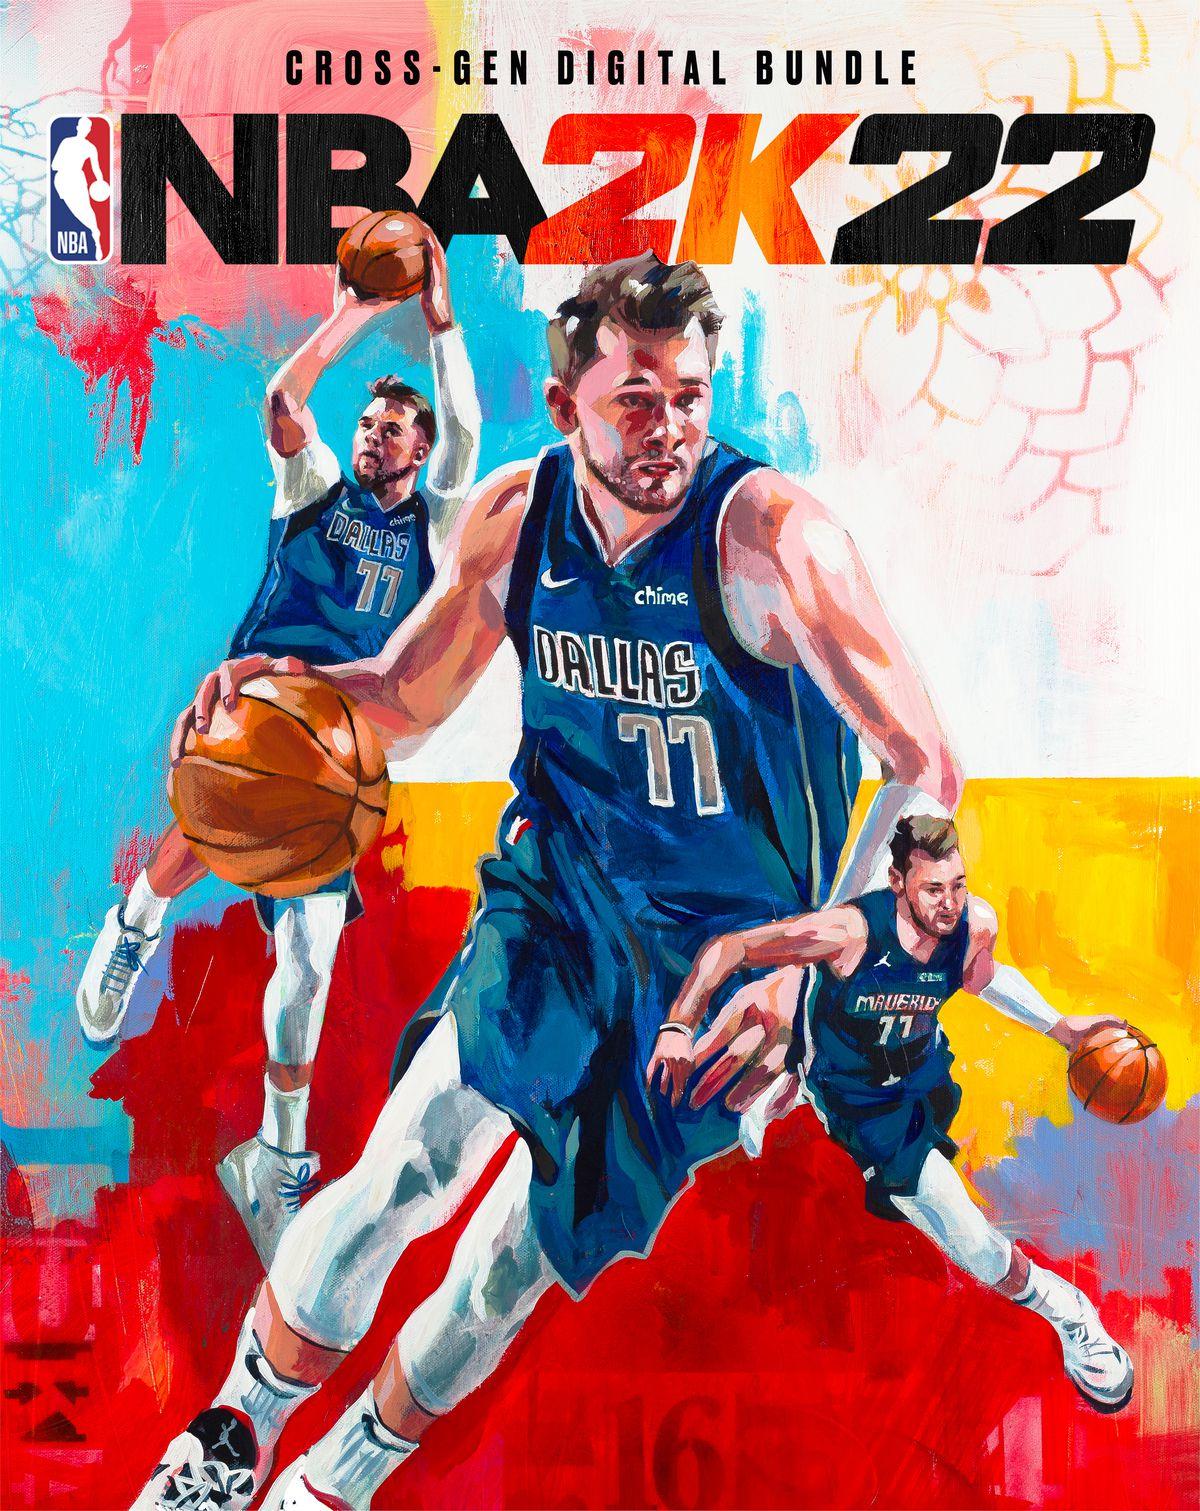 Dallas Mavericks star Luka Doncic on the NBA 2K cover.